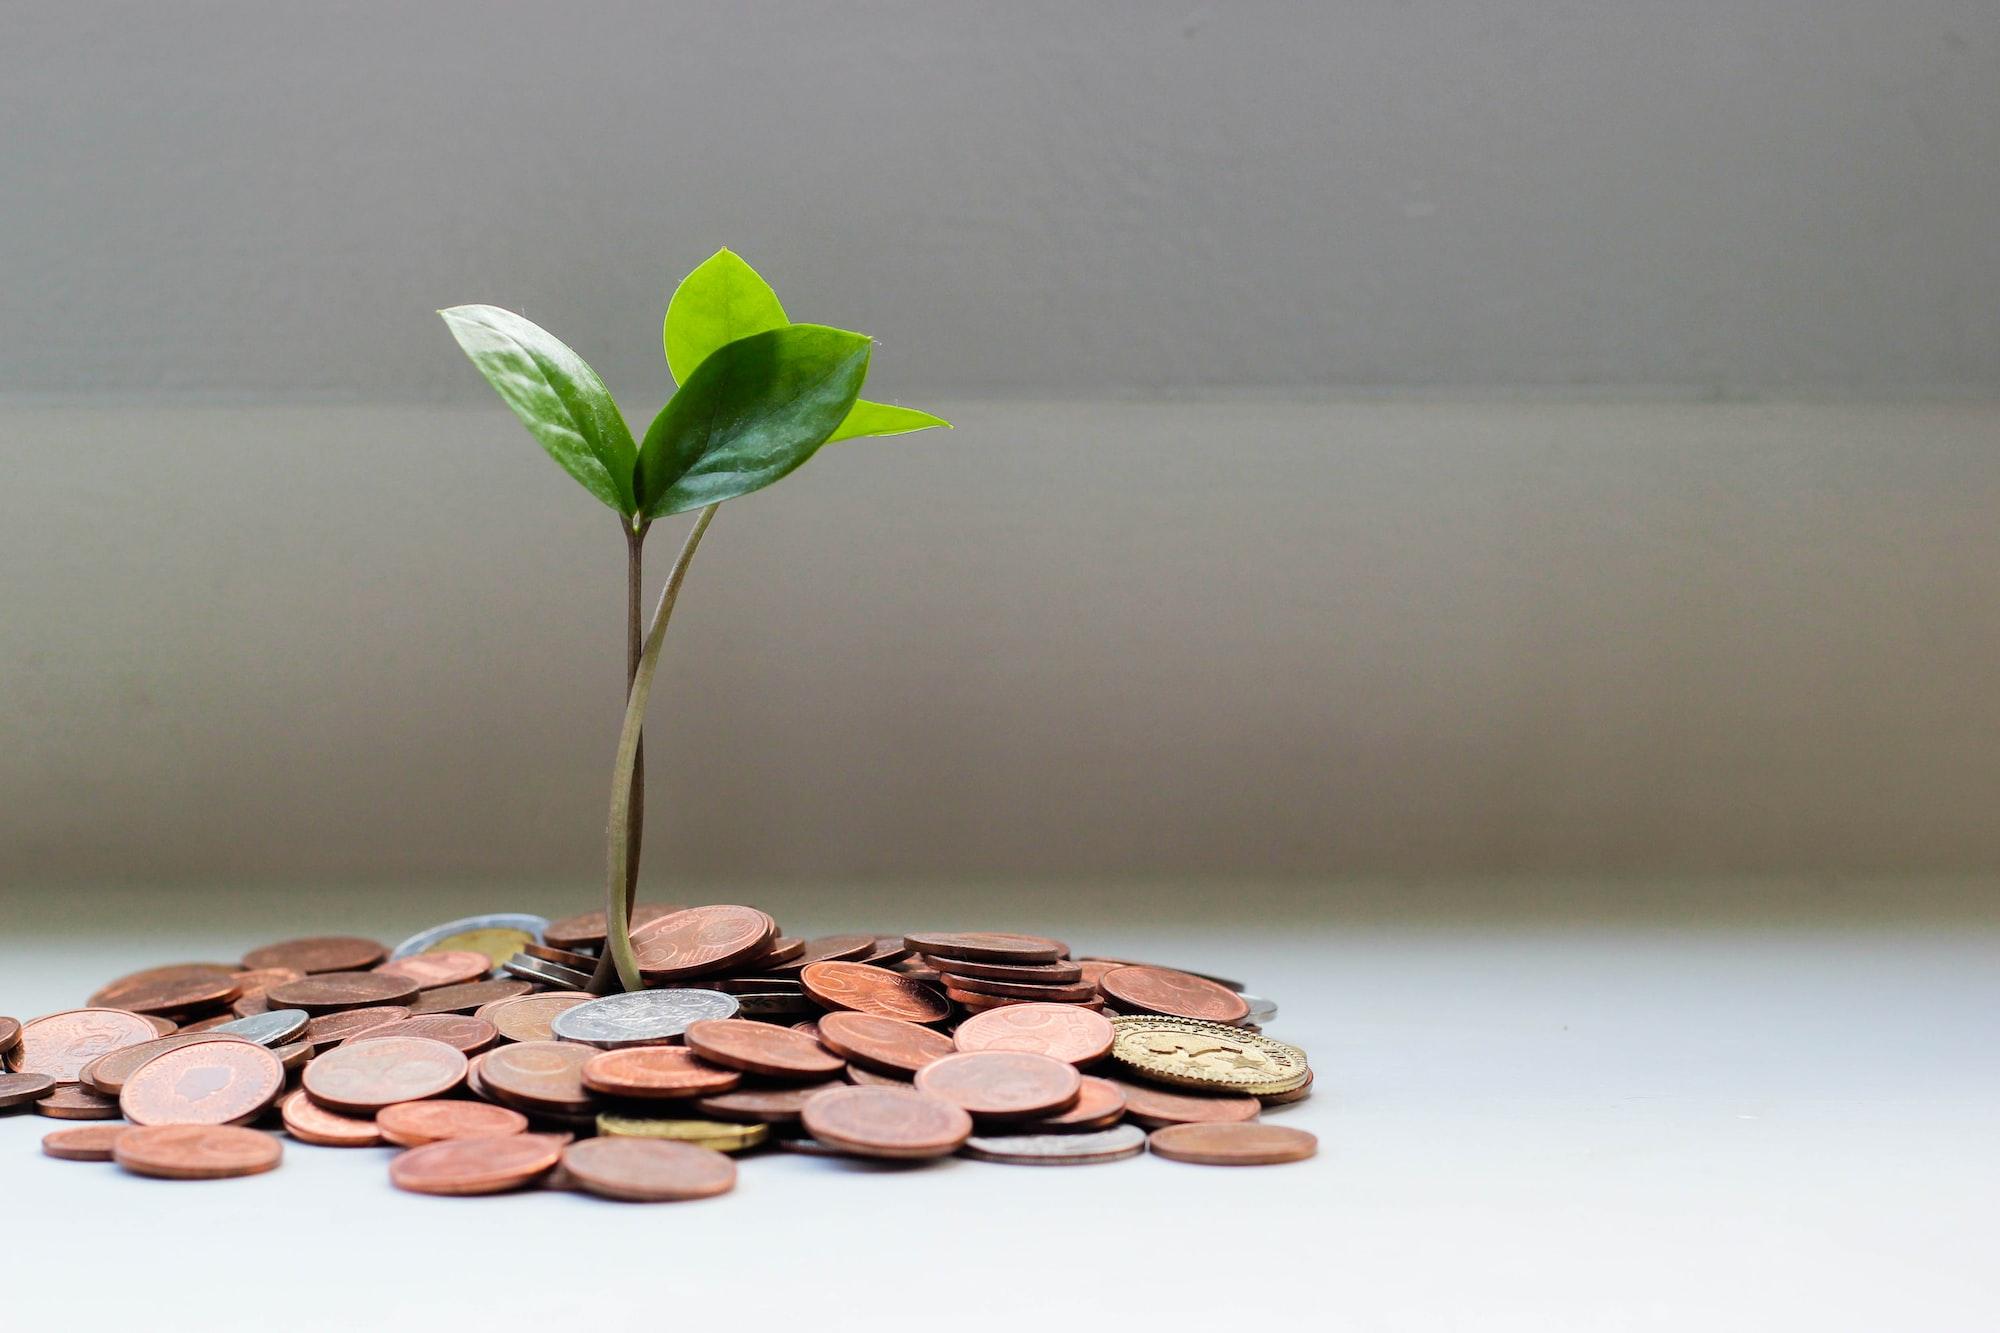 Financial situation: April 2021